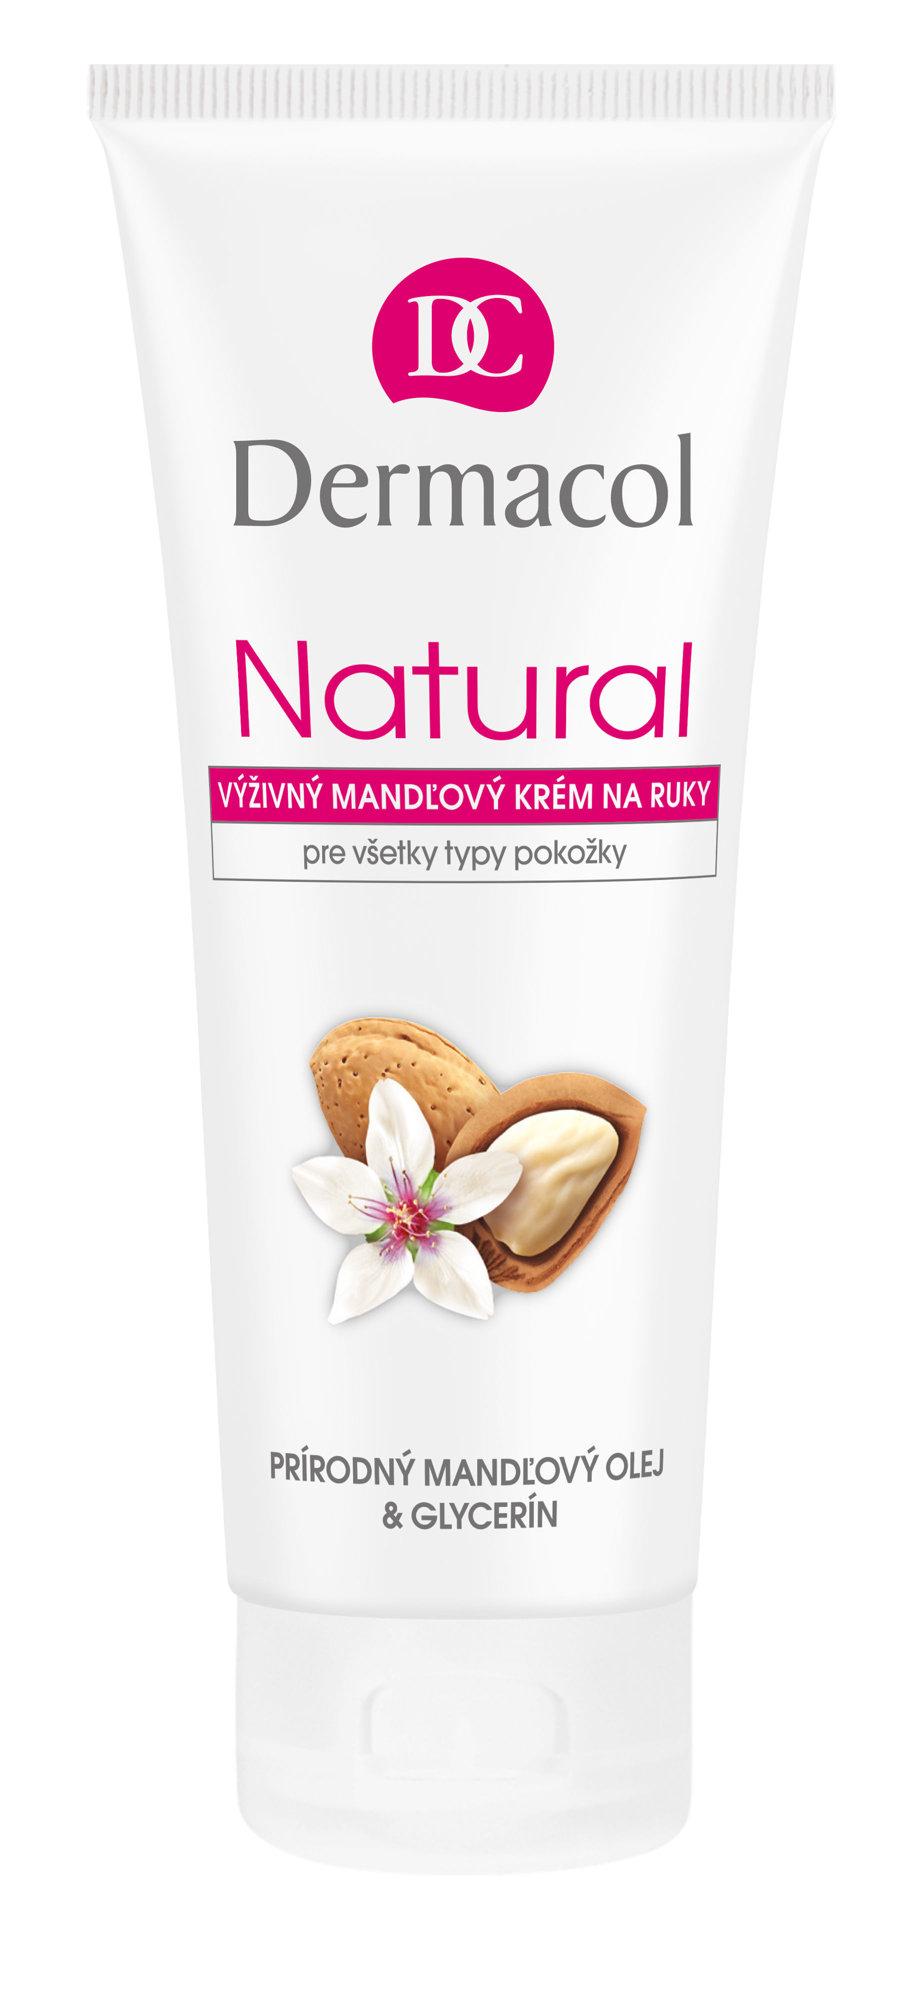 Priemonės rankoms ir pėdoms Dermacol Natural Almond